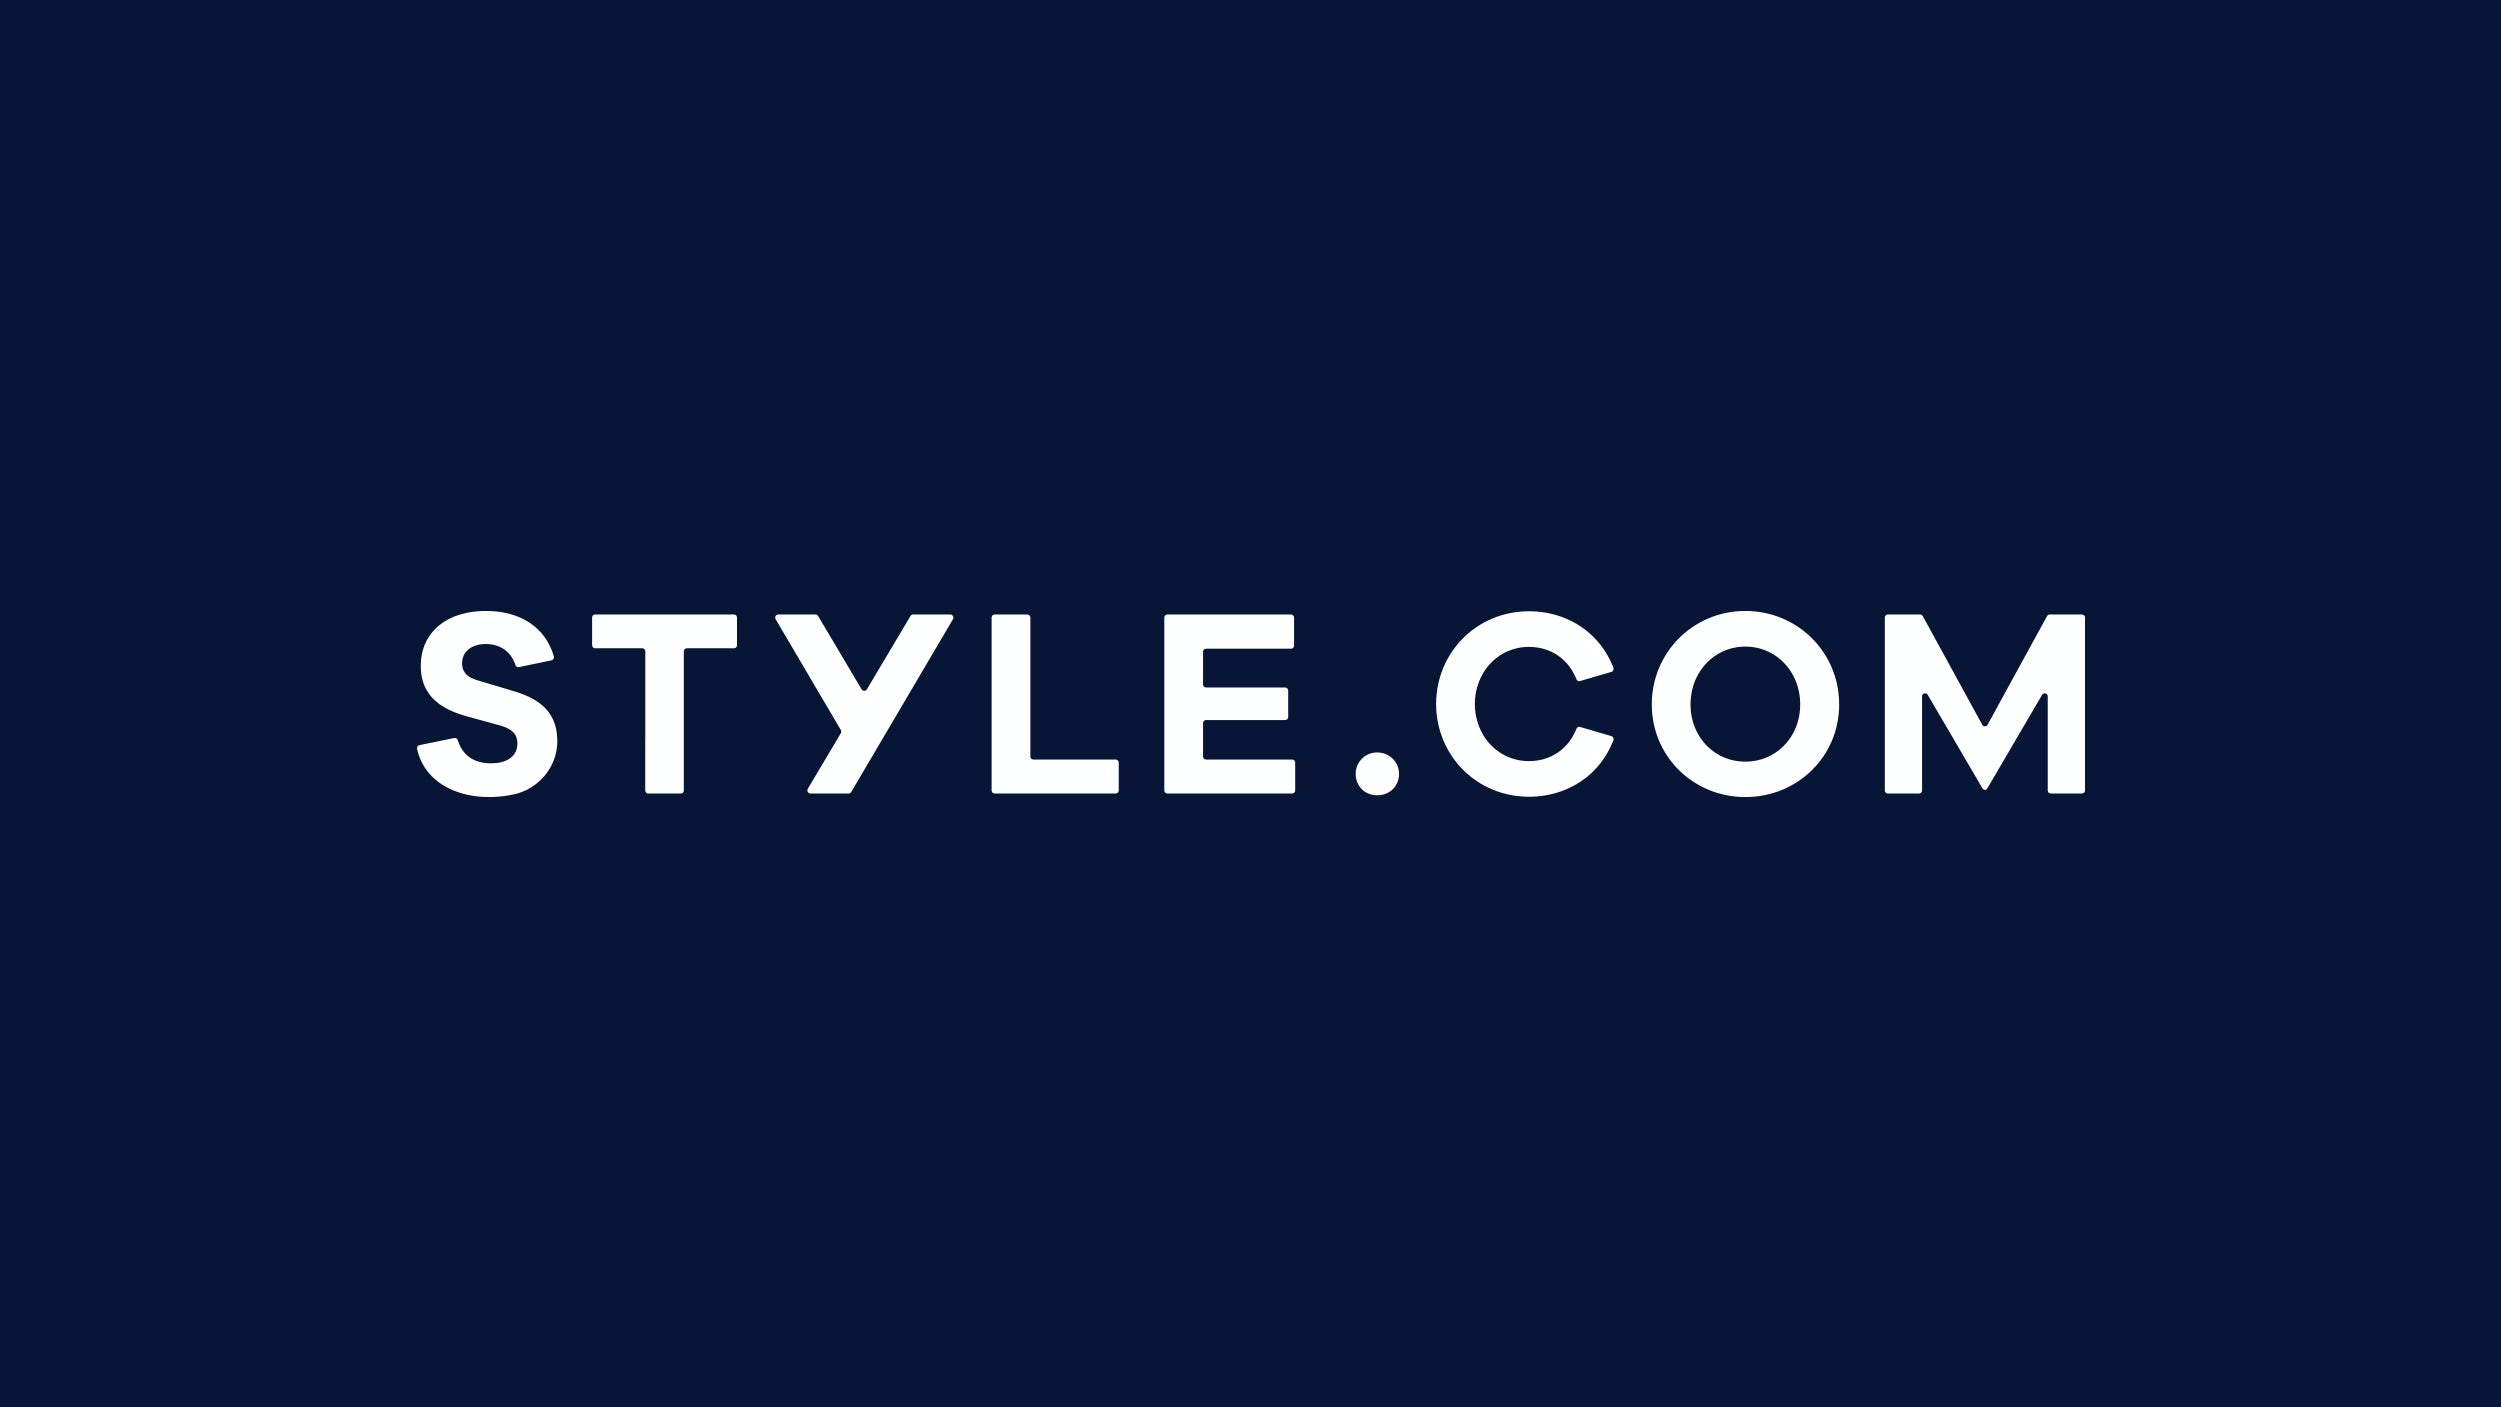 Style.com company logo